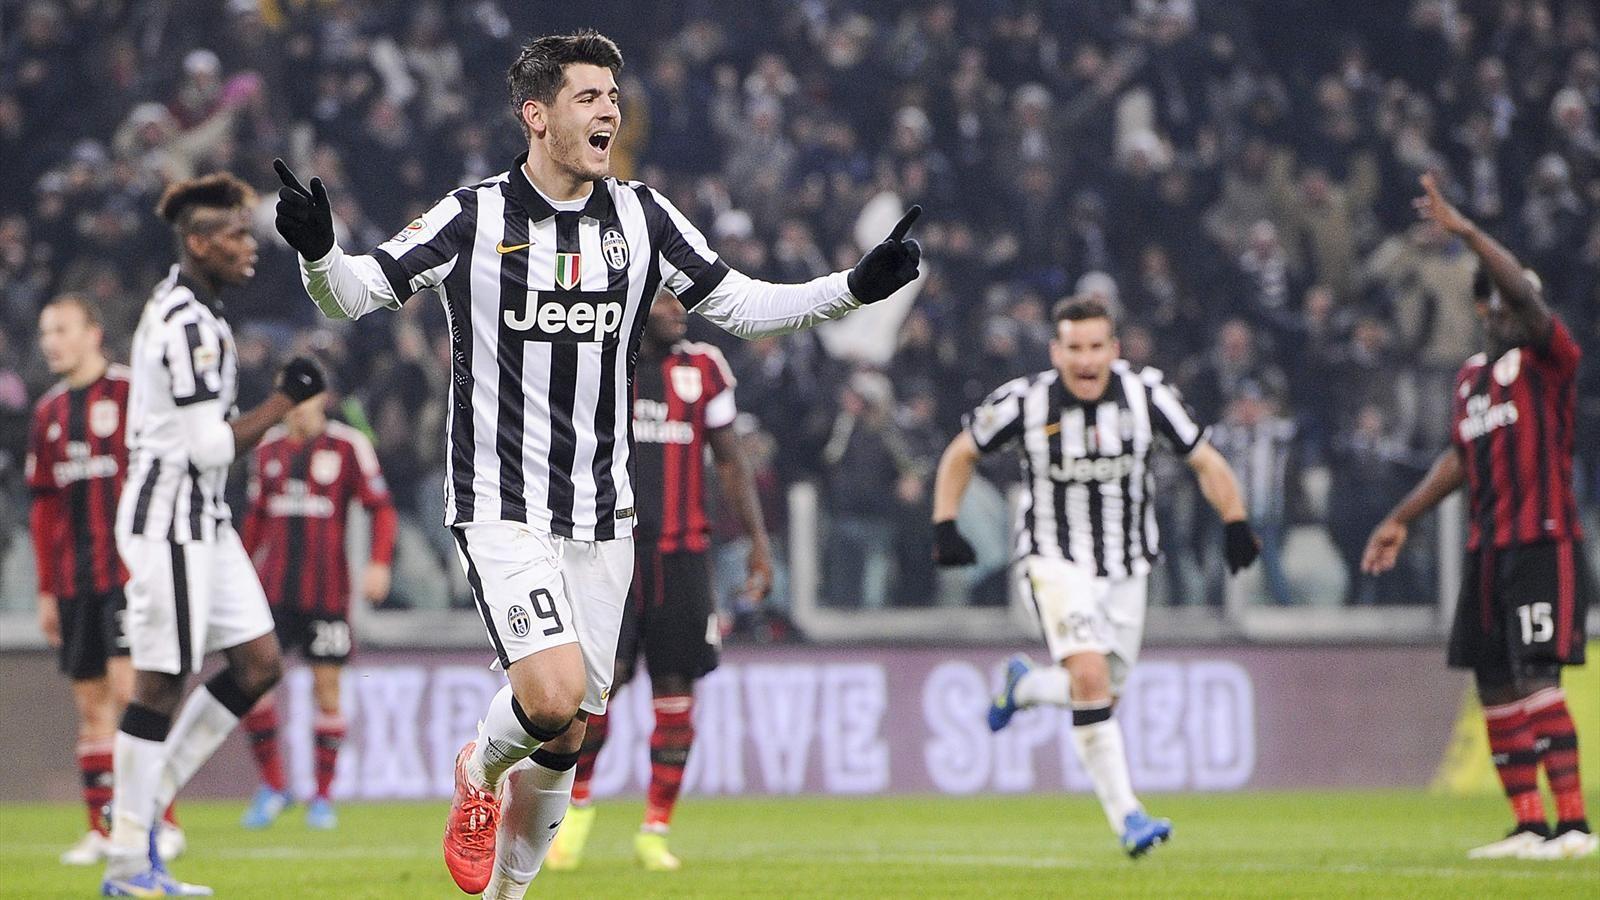 Трансляция матча Милан — Ювентус, 9 апреля 2016